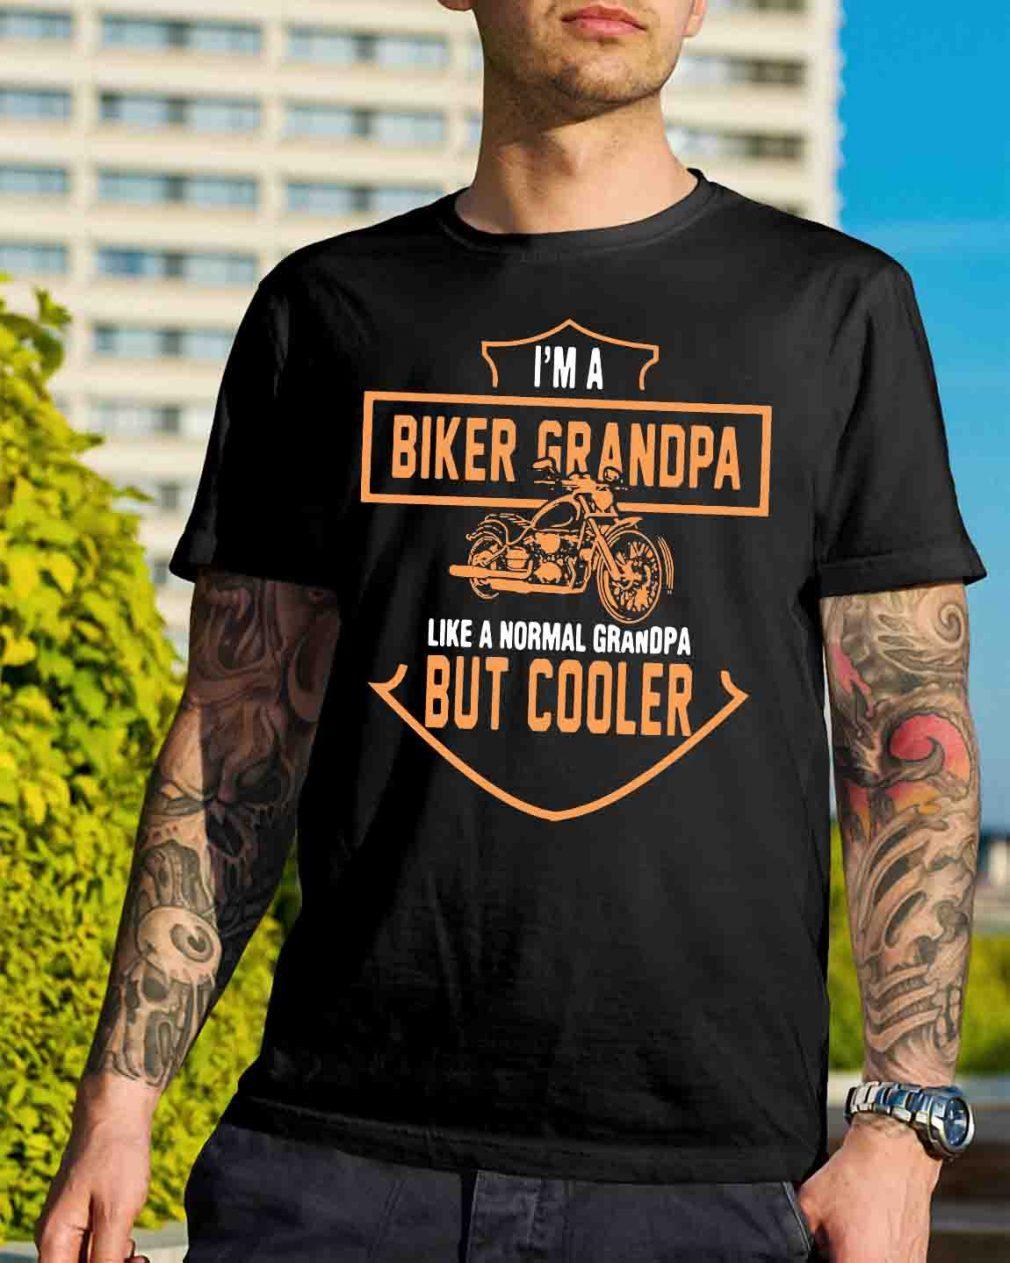 I'm a biker grandpa like a normal grandpa but cooler shirt